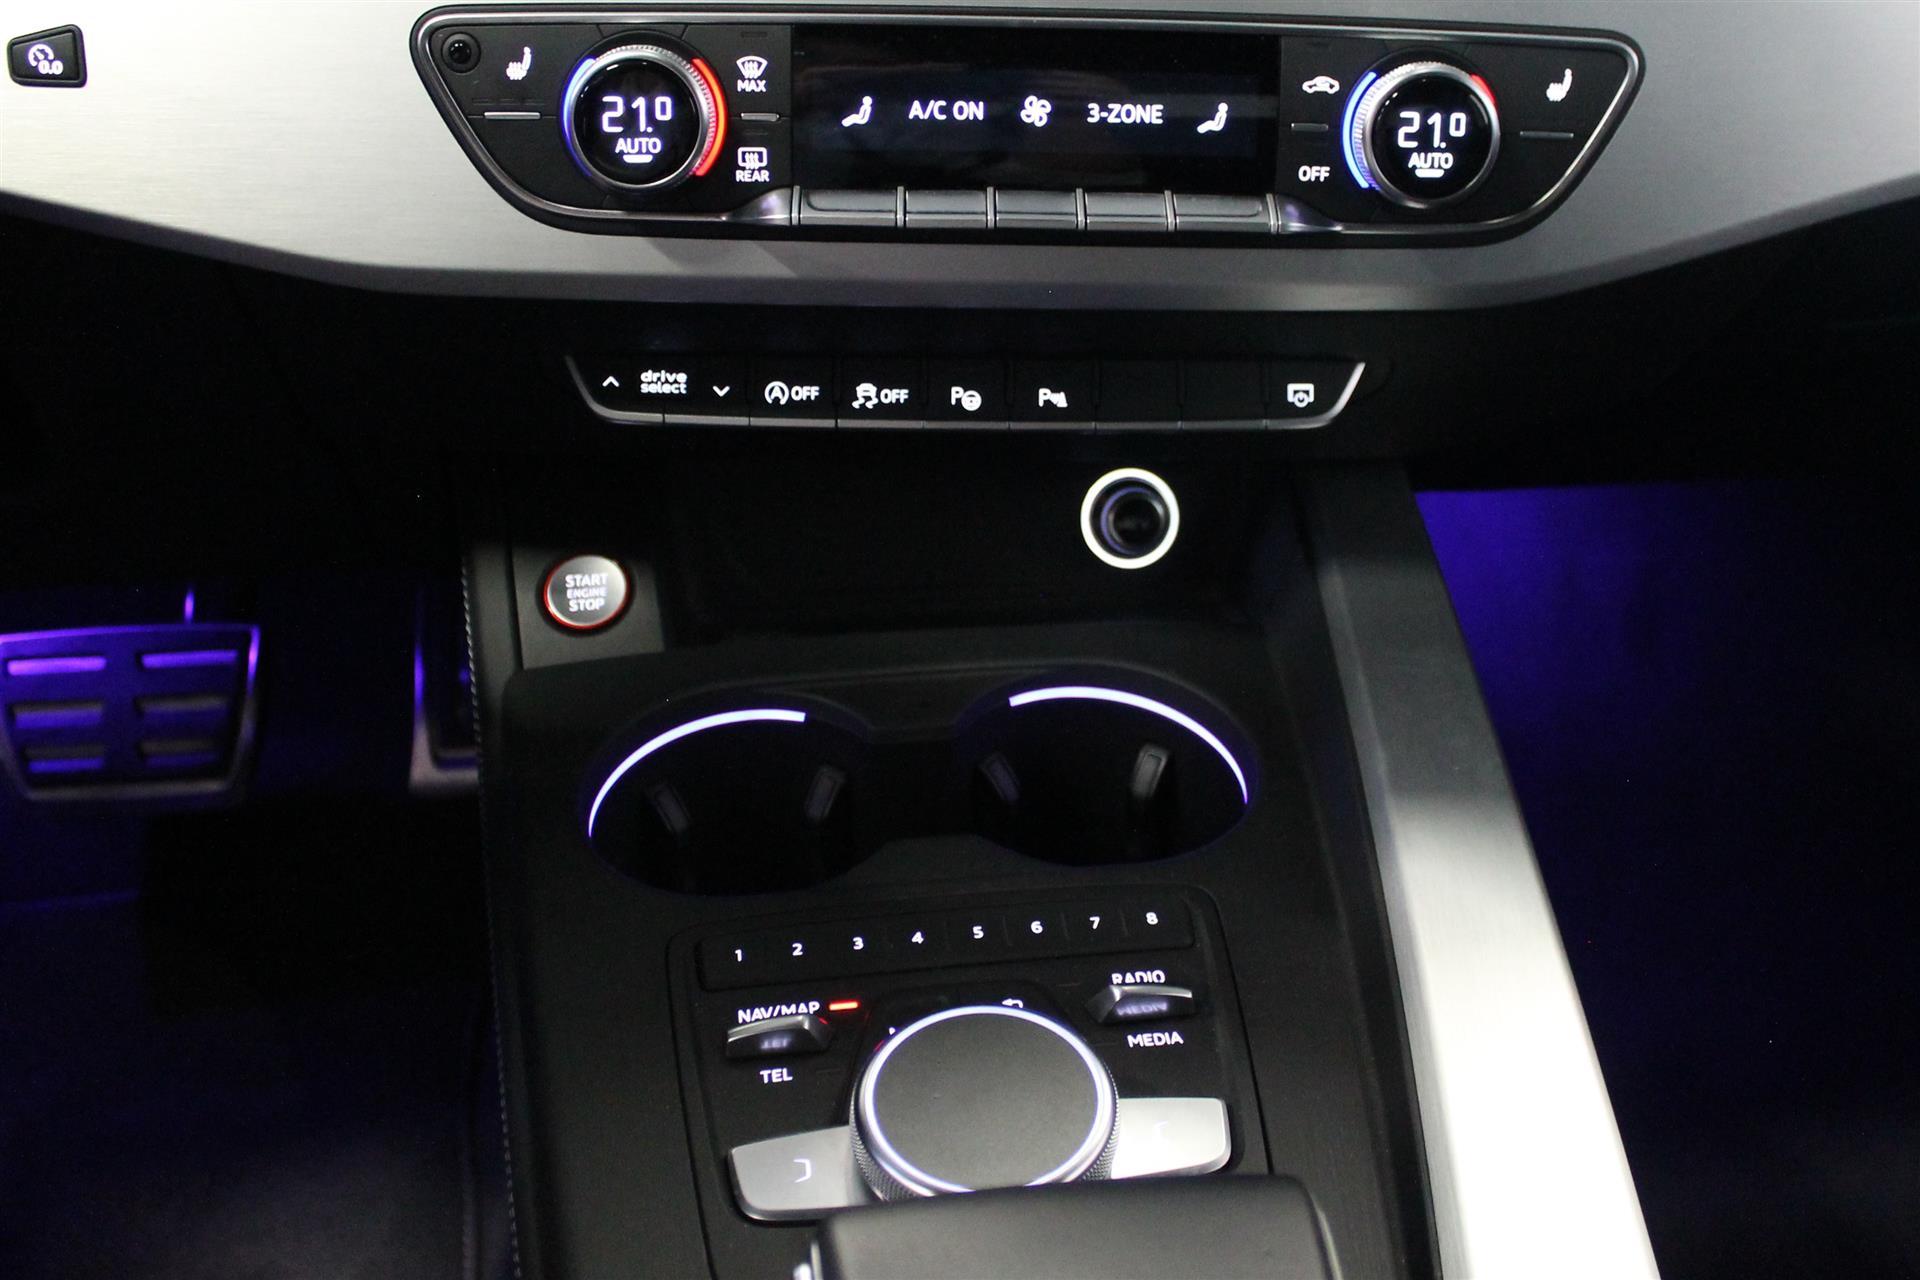 Sportback 3,0 TFSI Quattro Tiptr. 354HK 5d 8g Trinl. Gear image6